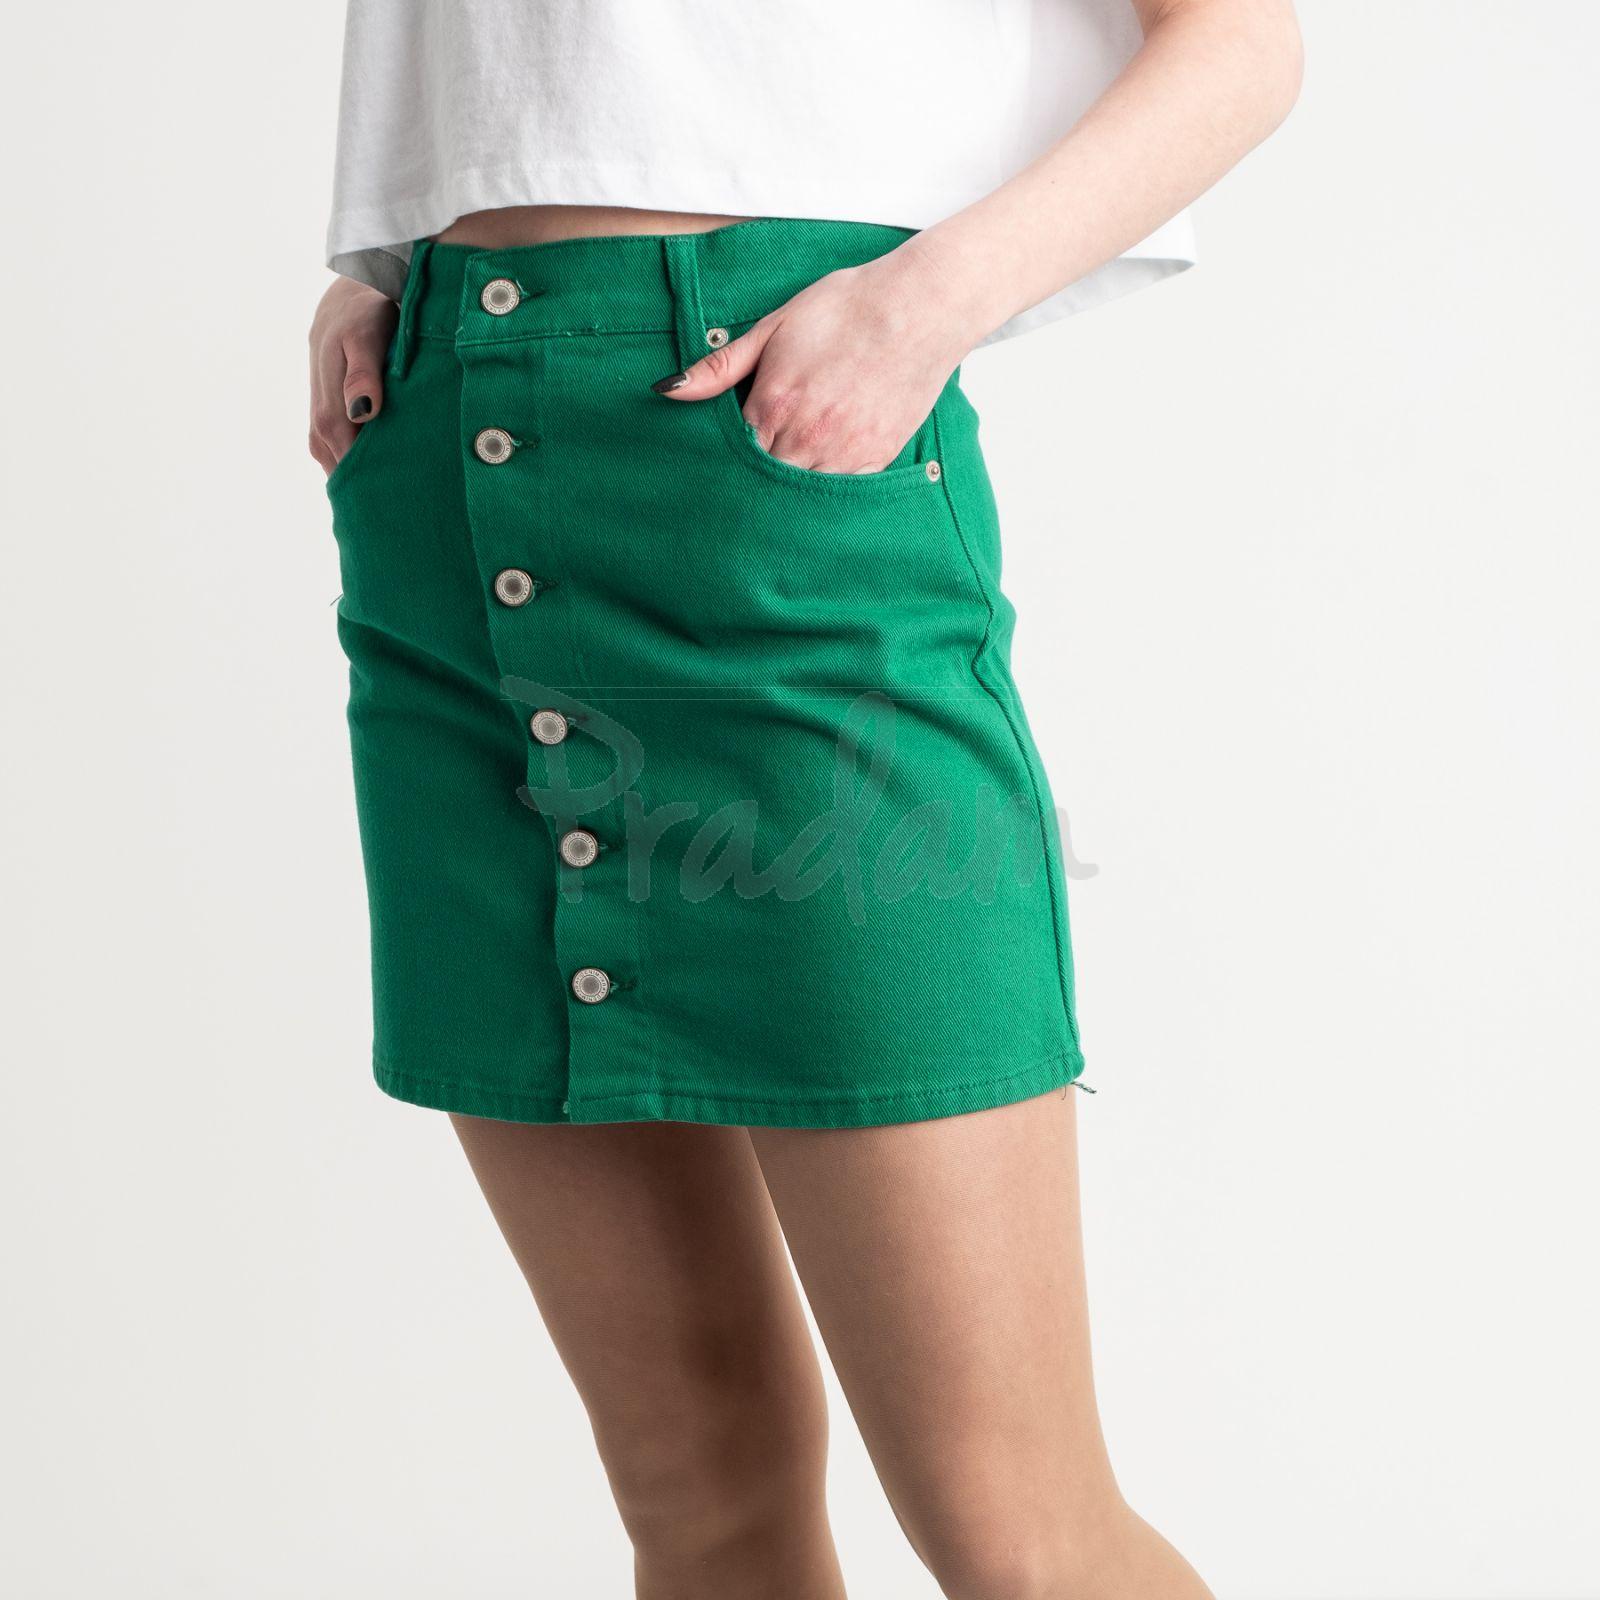 2834 XRay юбка на пуговицах зеленая котоновая (6 ед. размеры: 34.34.36.36.38.40)